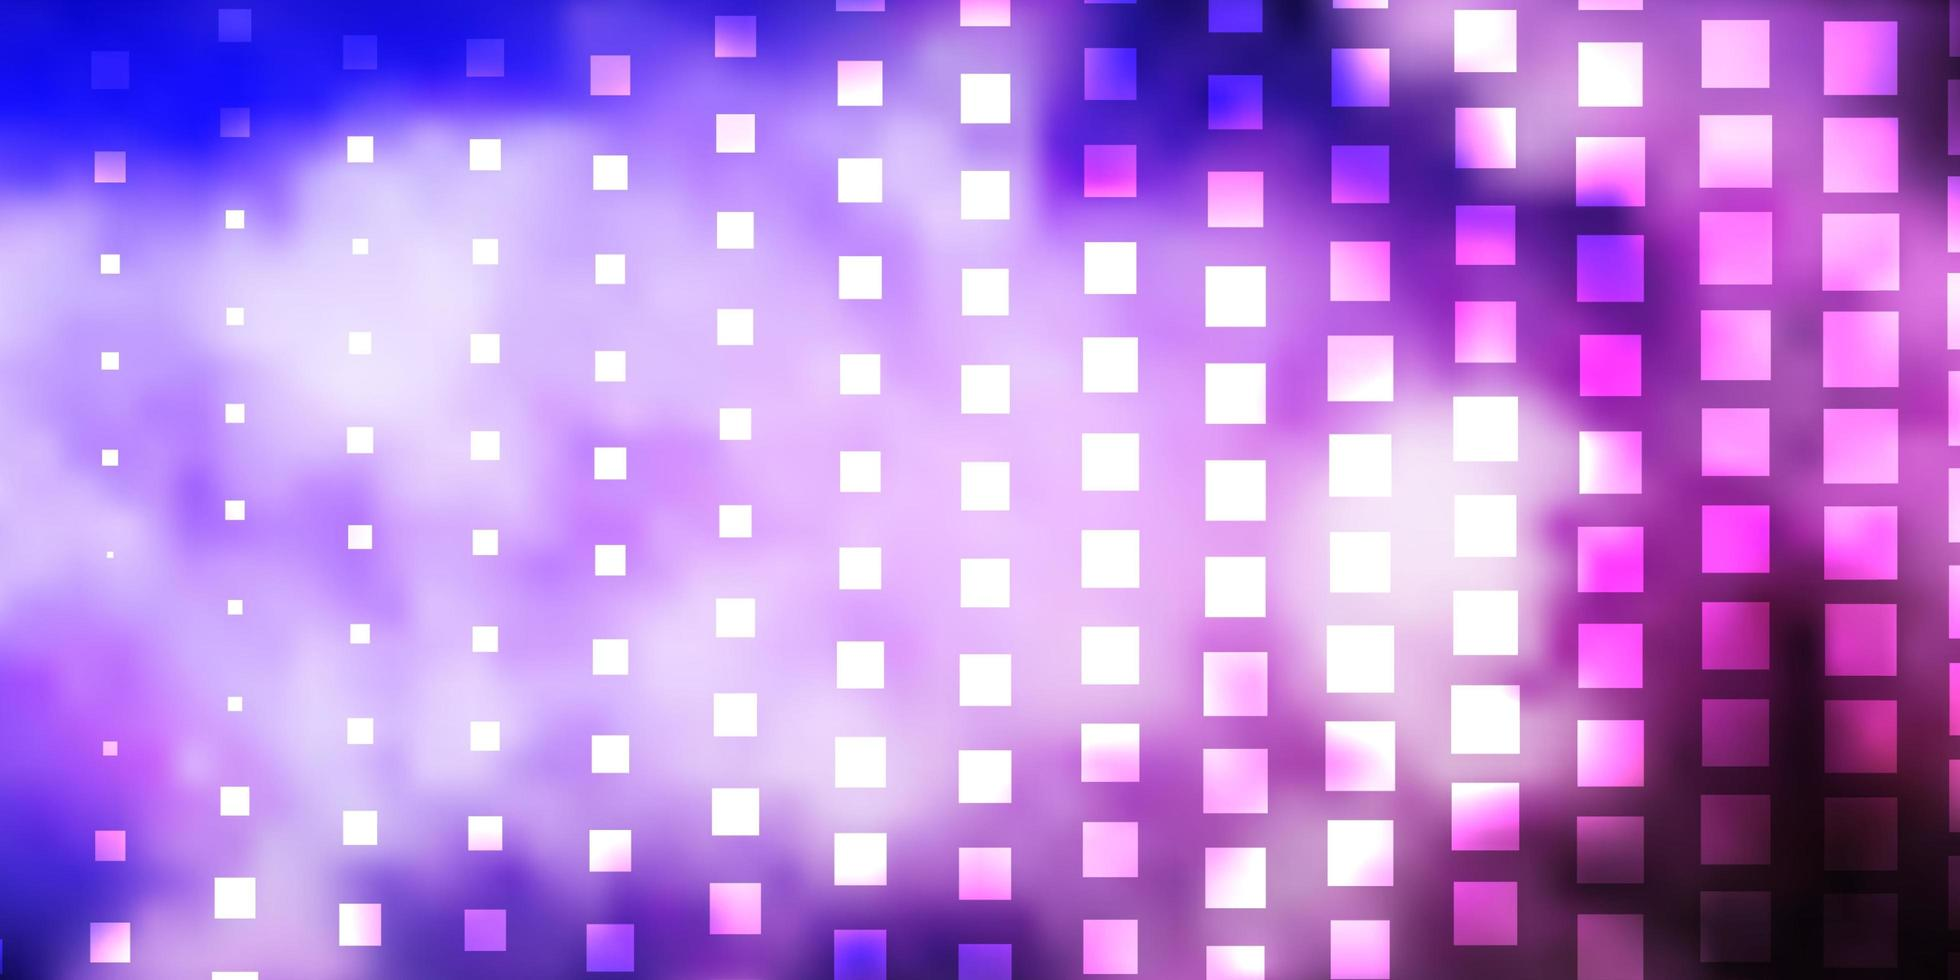 lila bakgrund med rektanglar. vektor